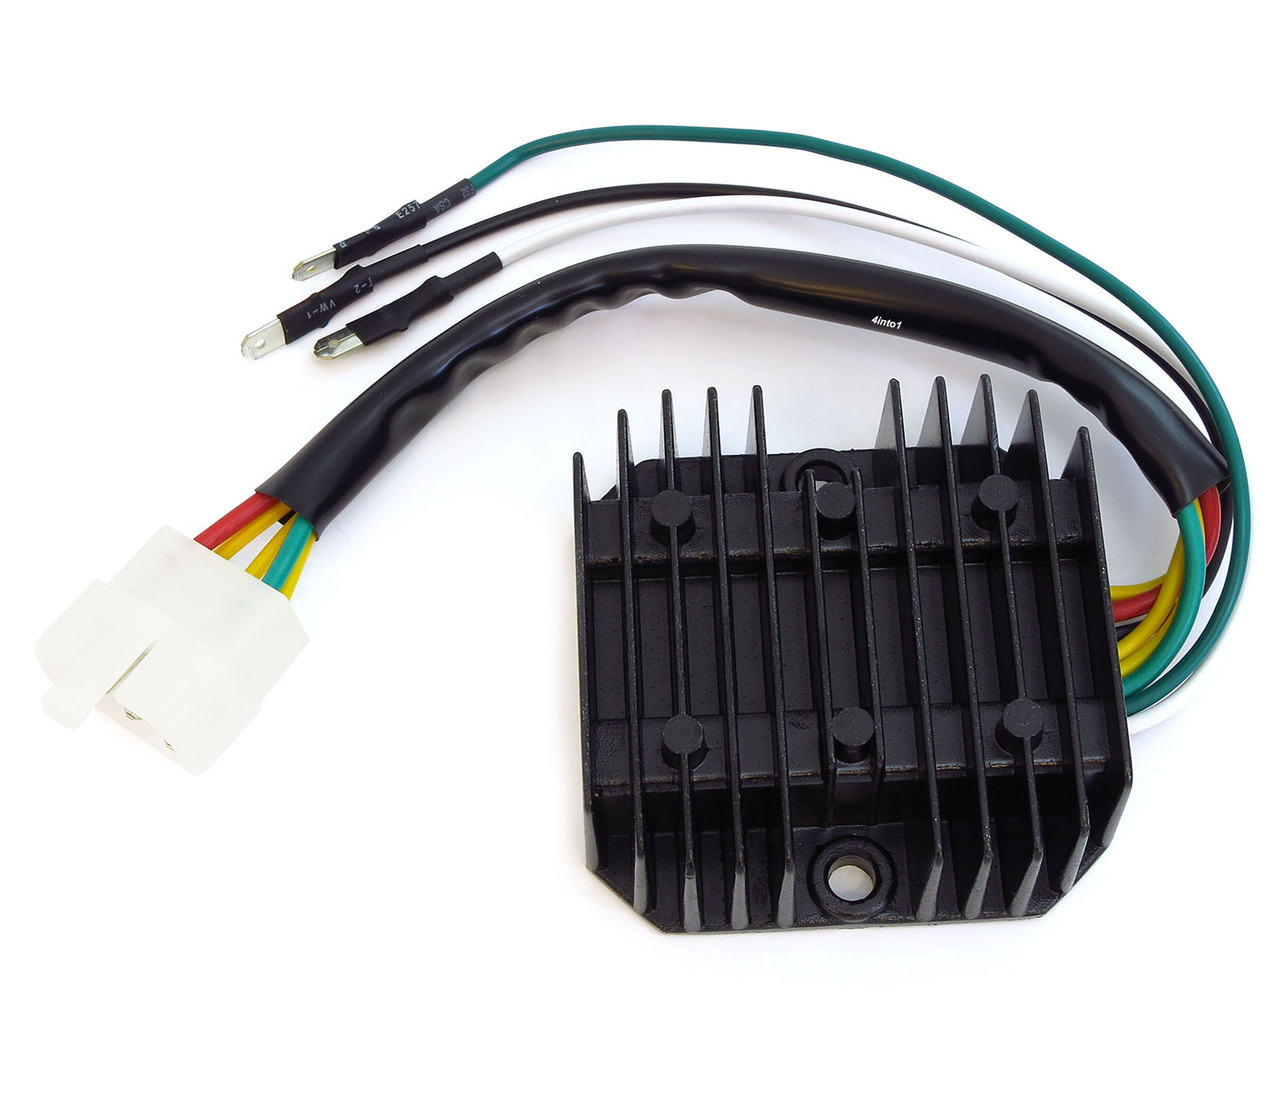 hight resolution of regulator rectifier honda cb350f cb400f cb500 cb550 cb750cb750 regulator rectifier wiring diagram 11